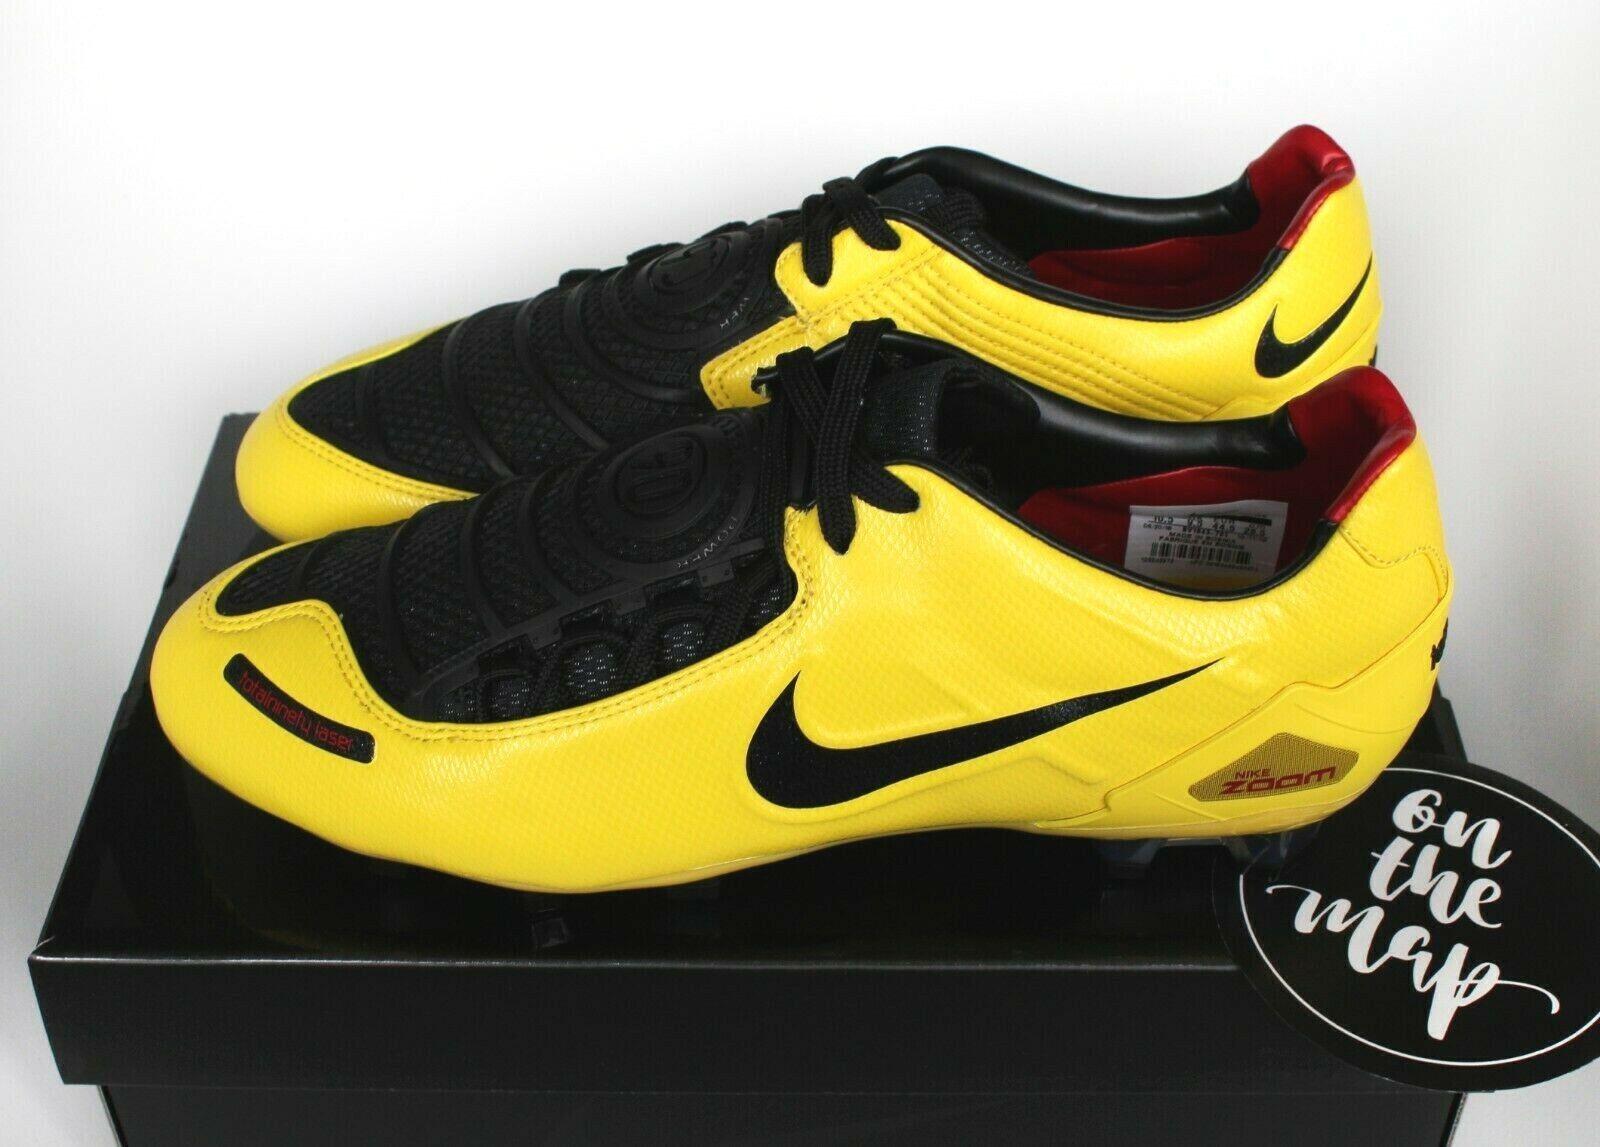 Nike Total 90 láser T90 FG botas 2019 remake Zest Negro Rojo Uk 5 6 9 10 EE. UU. nuevo